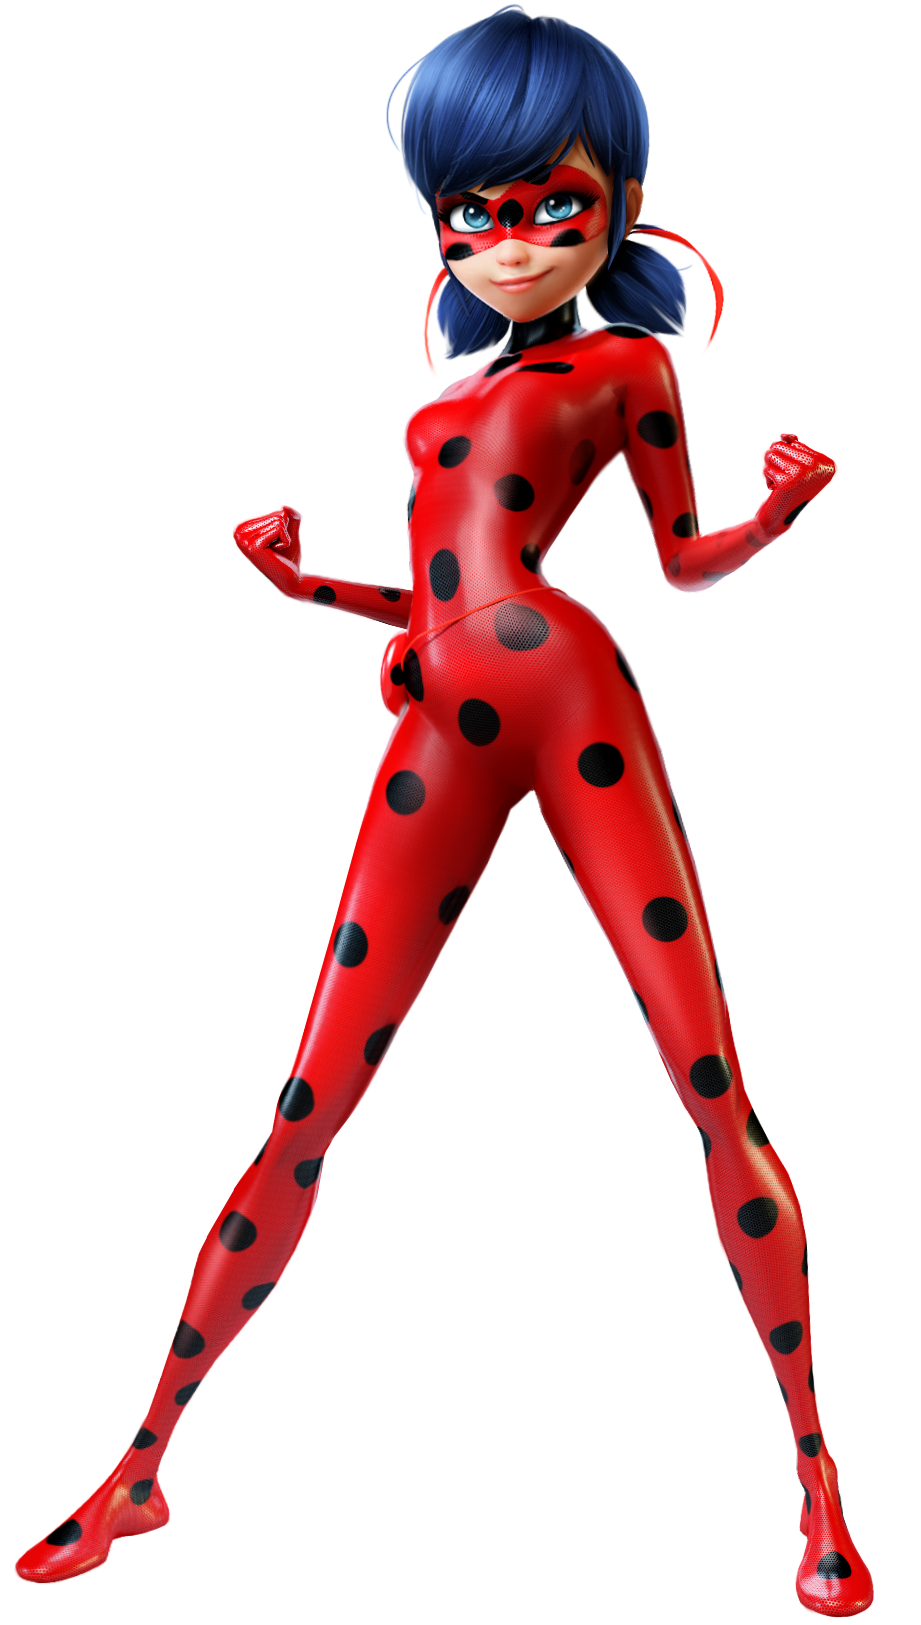 Dot clipart superhero. Ladybug heroes wiki fandom